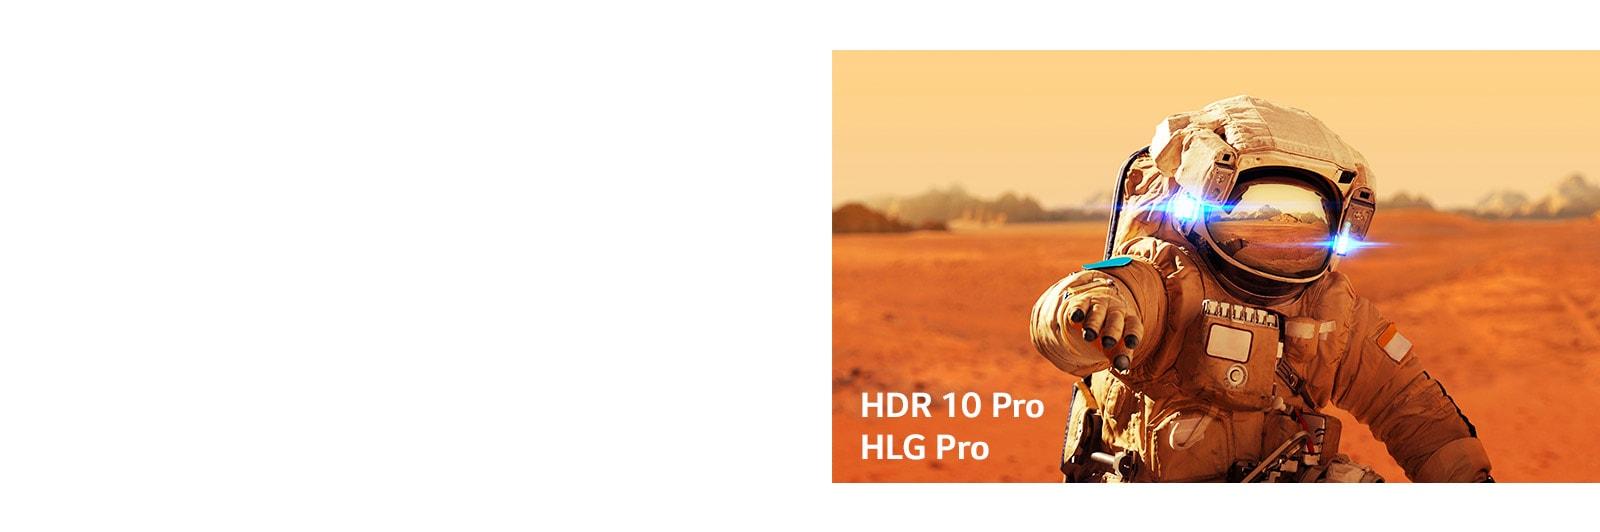 LG 65NANO86TNA HDR and HLG Pro